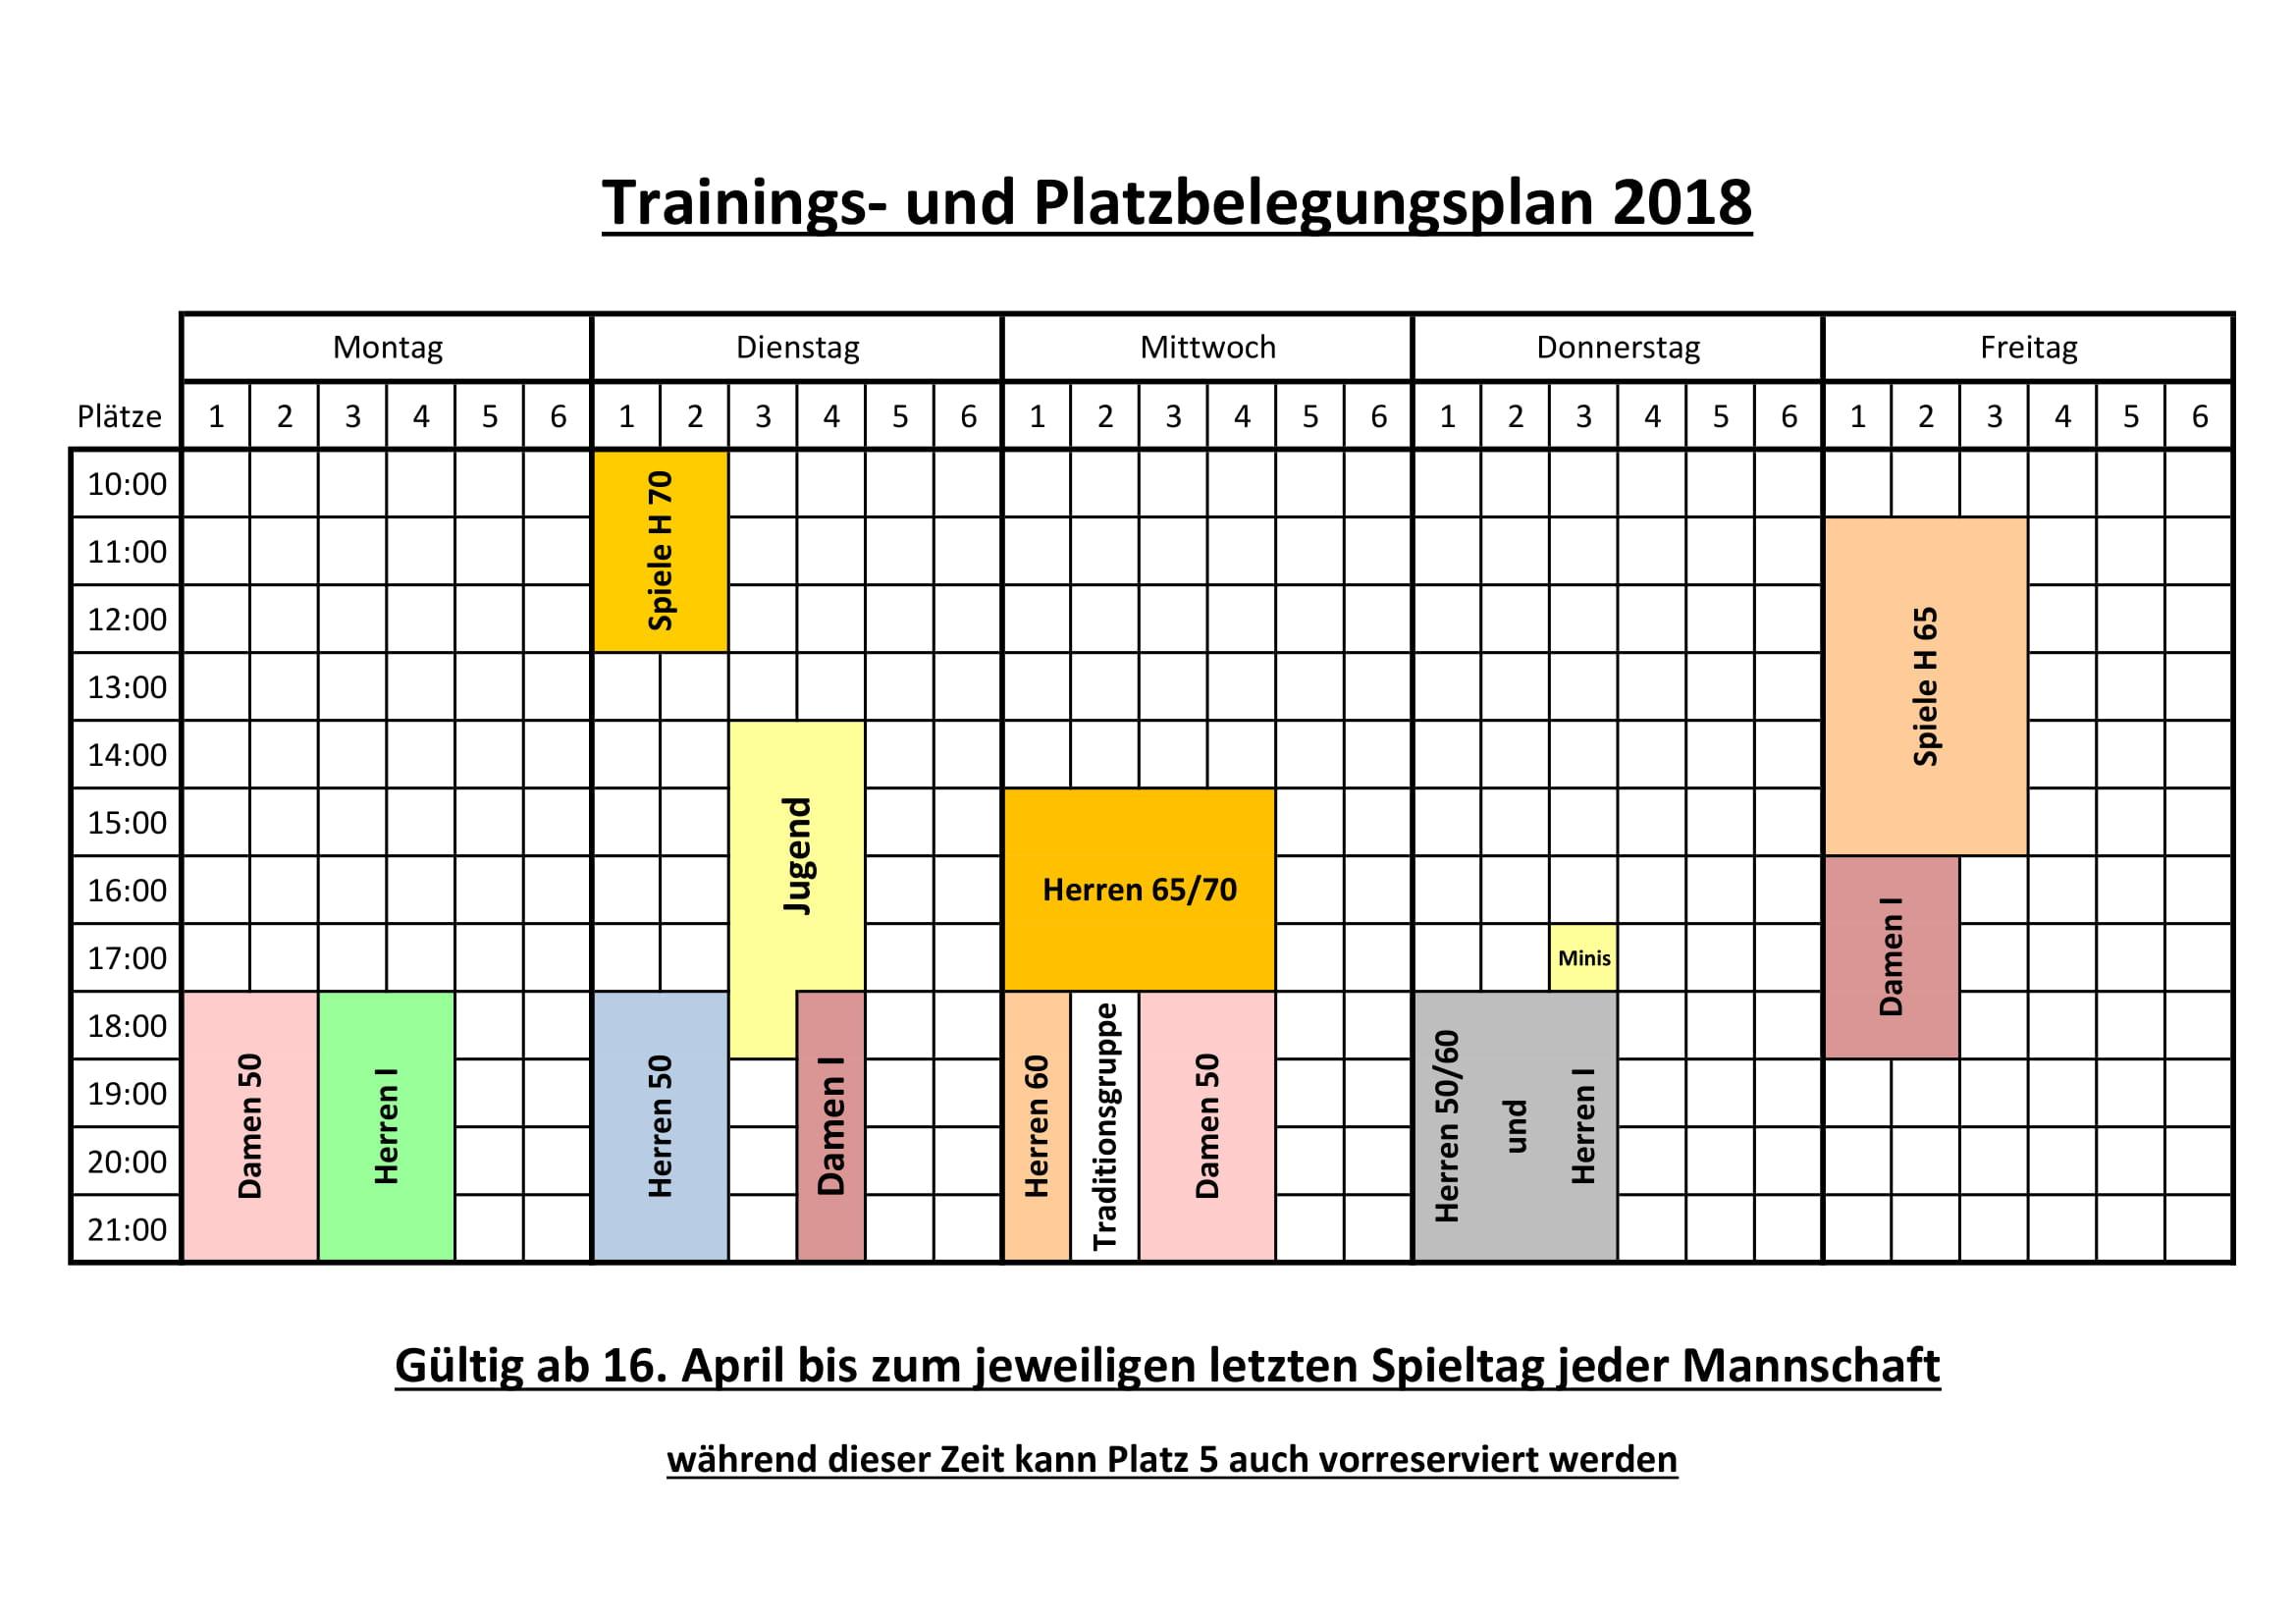 Trainingsplan 2018